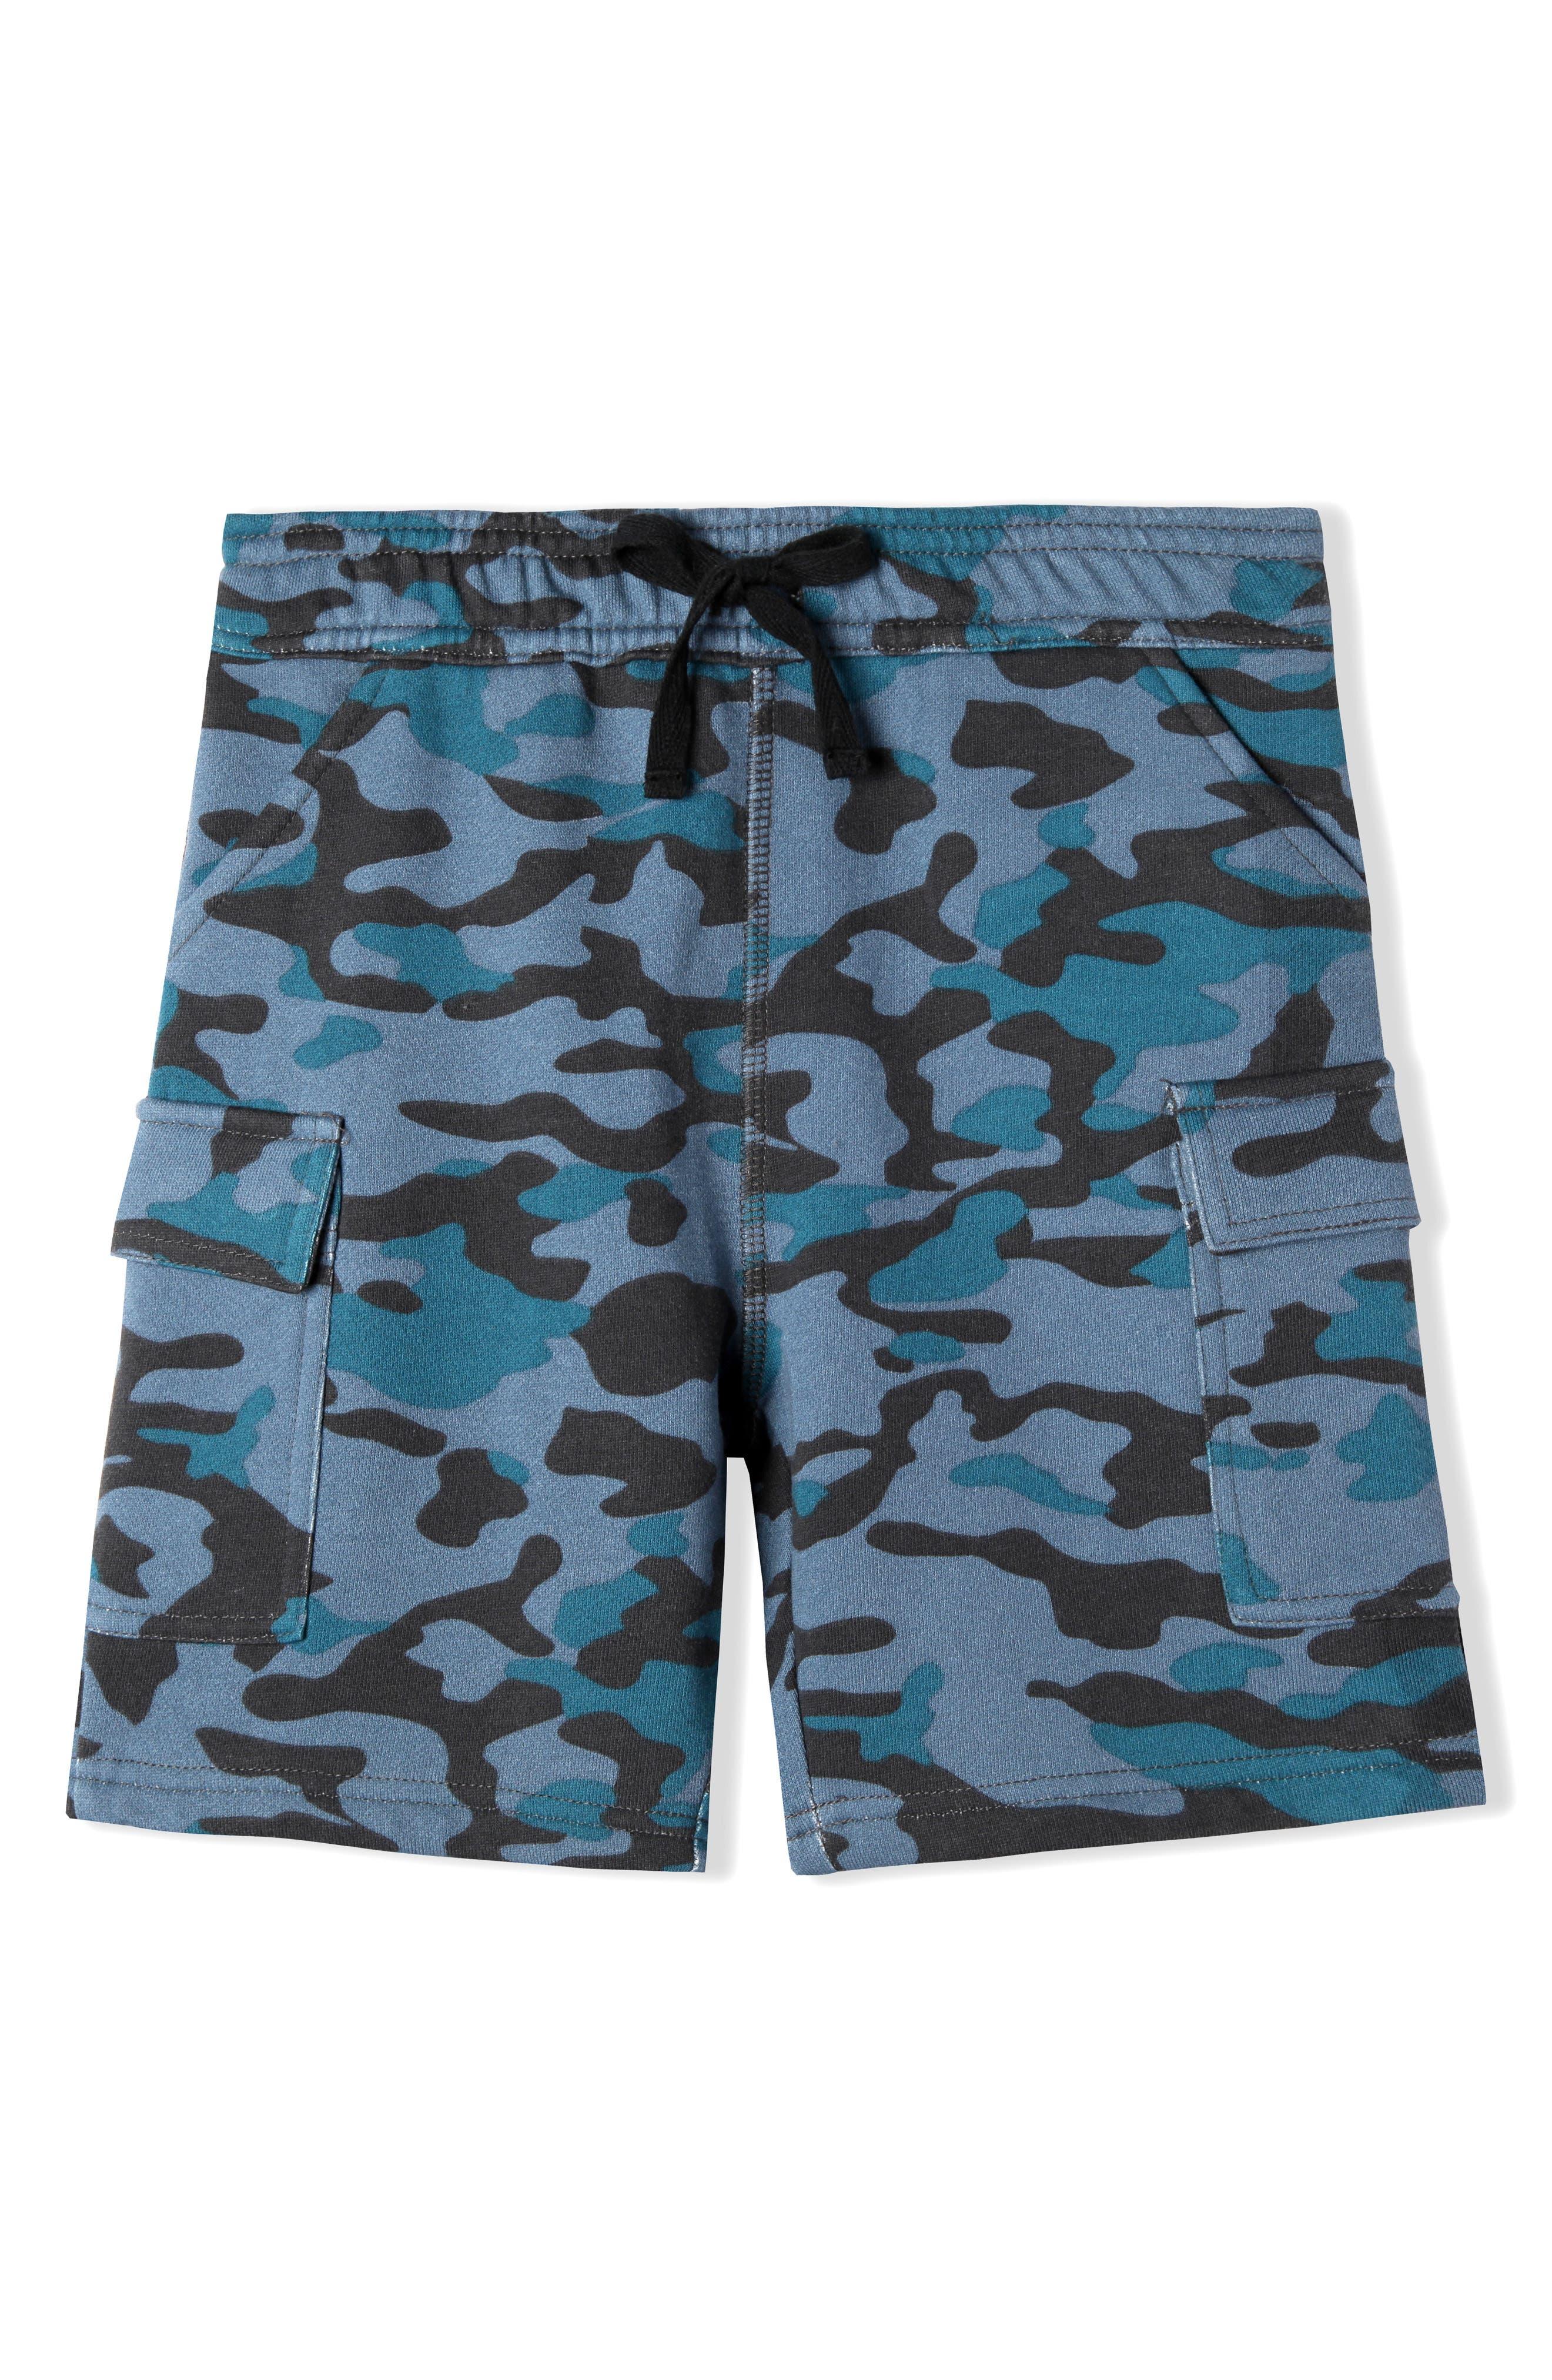 Ayden Print Shorts,                         Main,                         color, Navy Camo